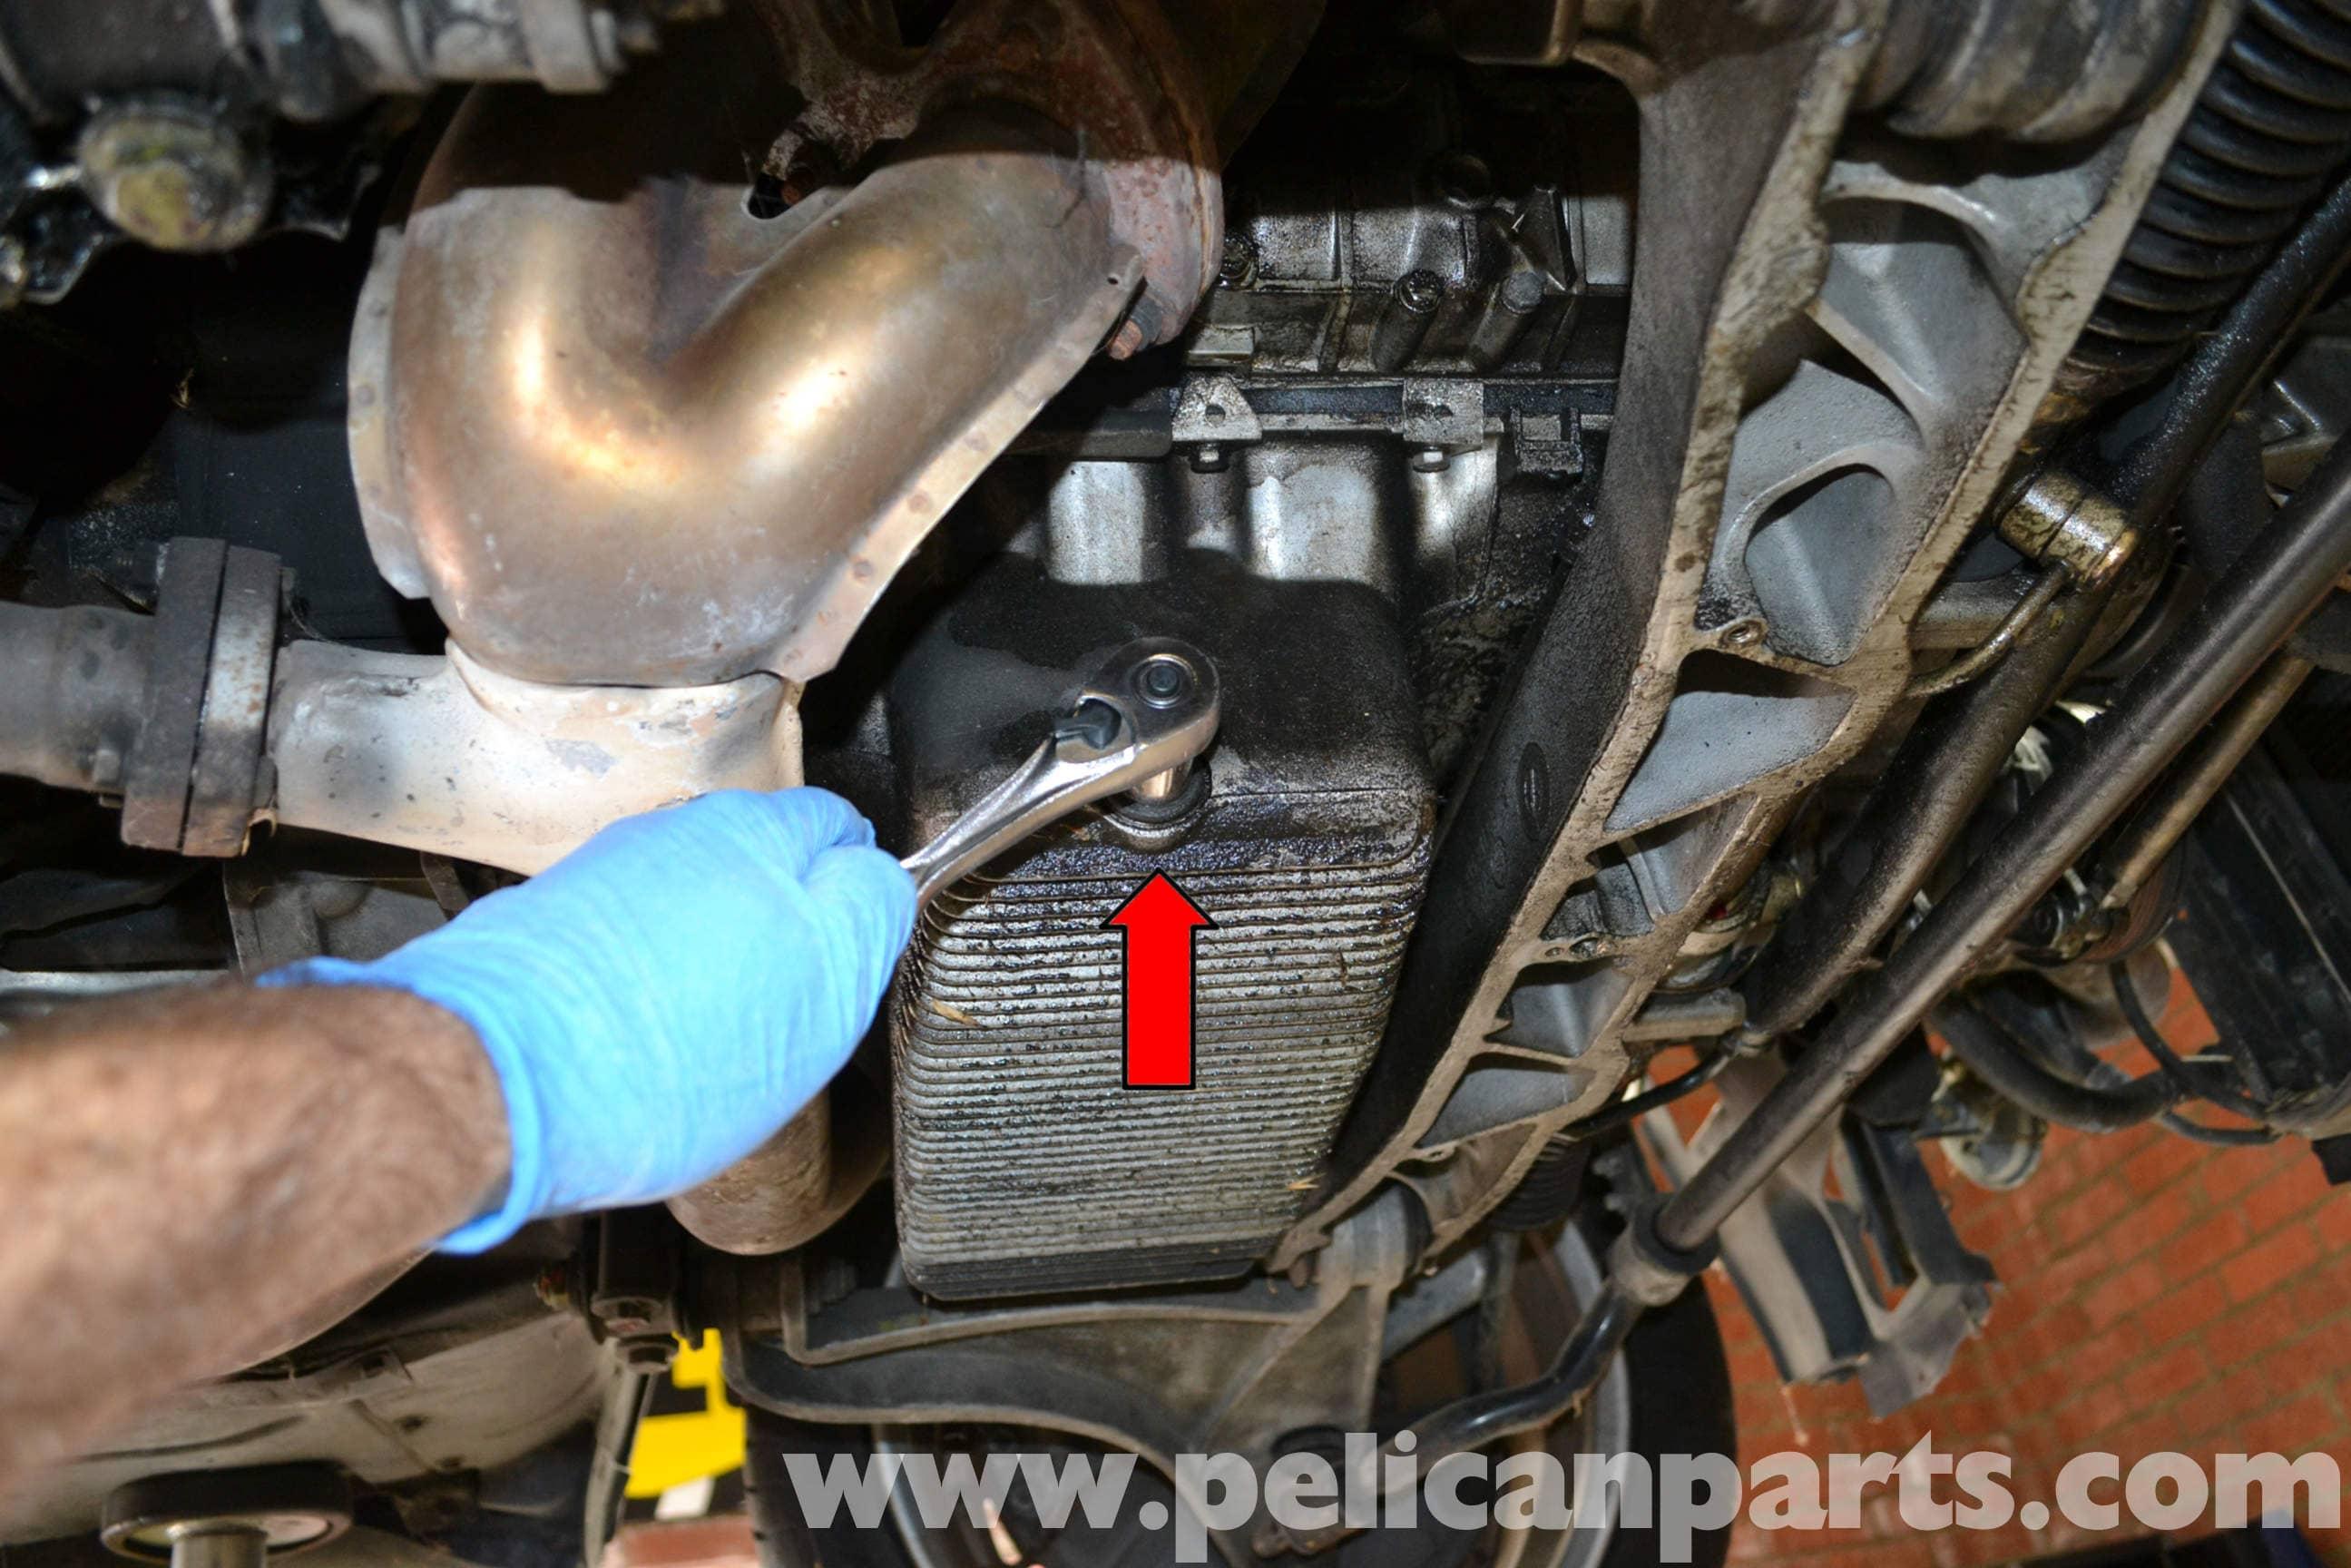 Porsche 944 Turbo Oil Pan Gasket Replacement 1986 1991